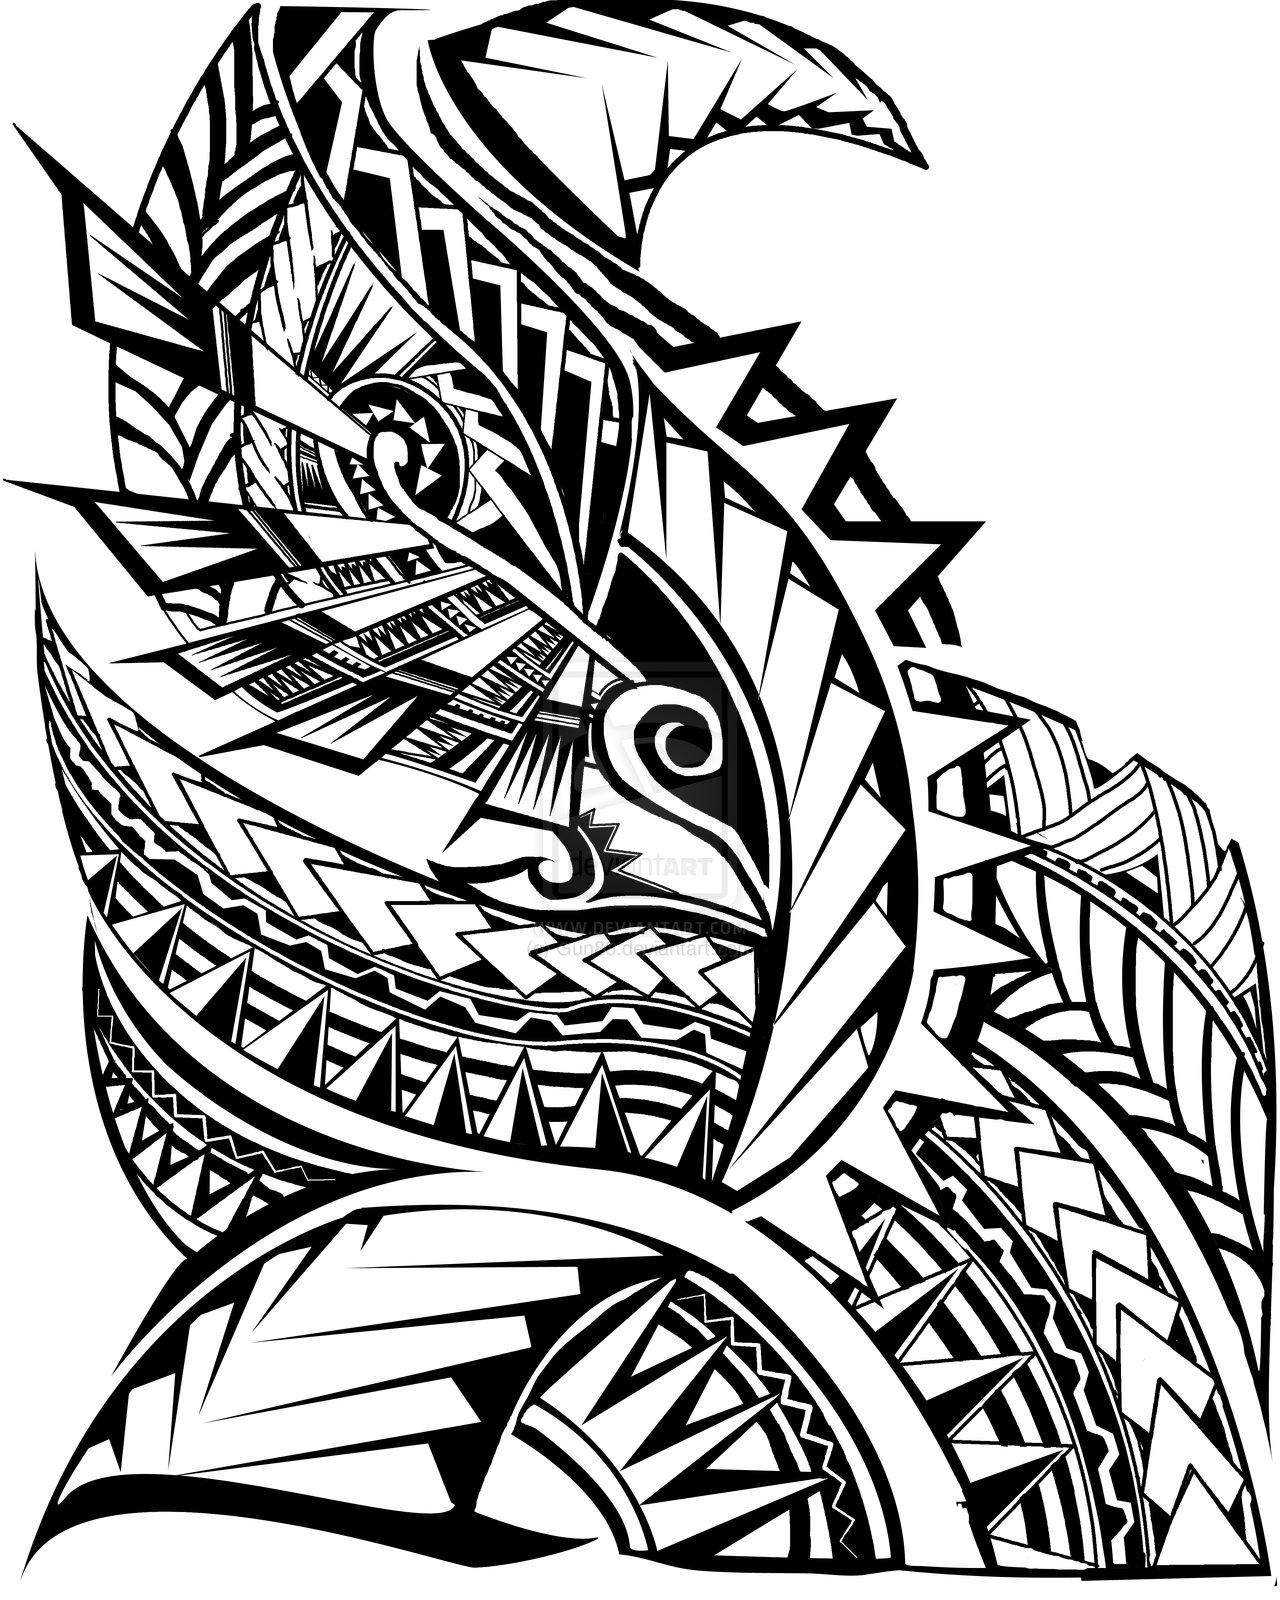 1280x1600 Libra Tattoos , Tattoos Drawings On Paper, Good Free